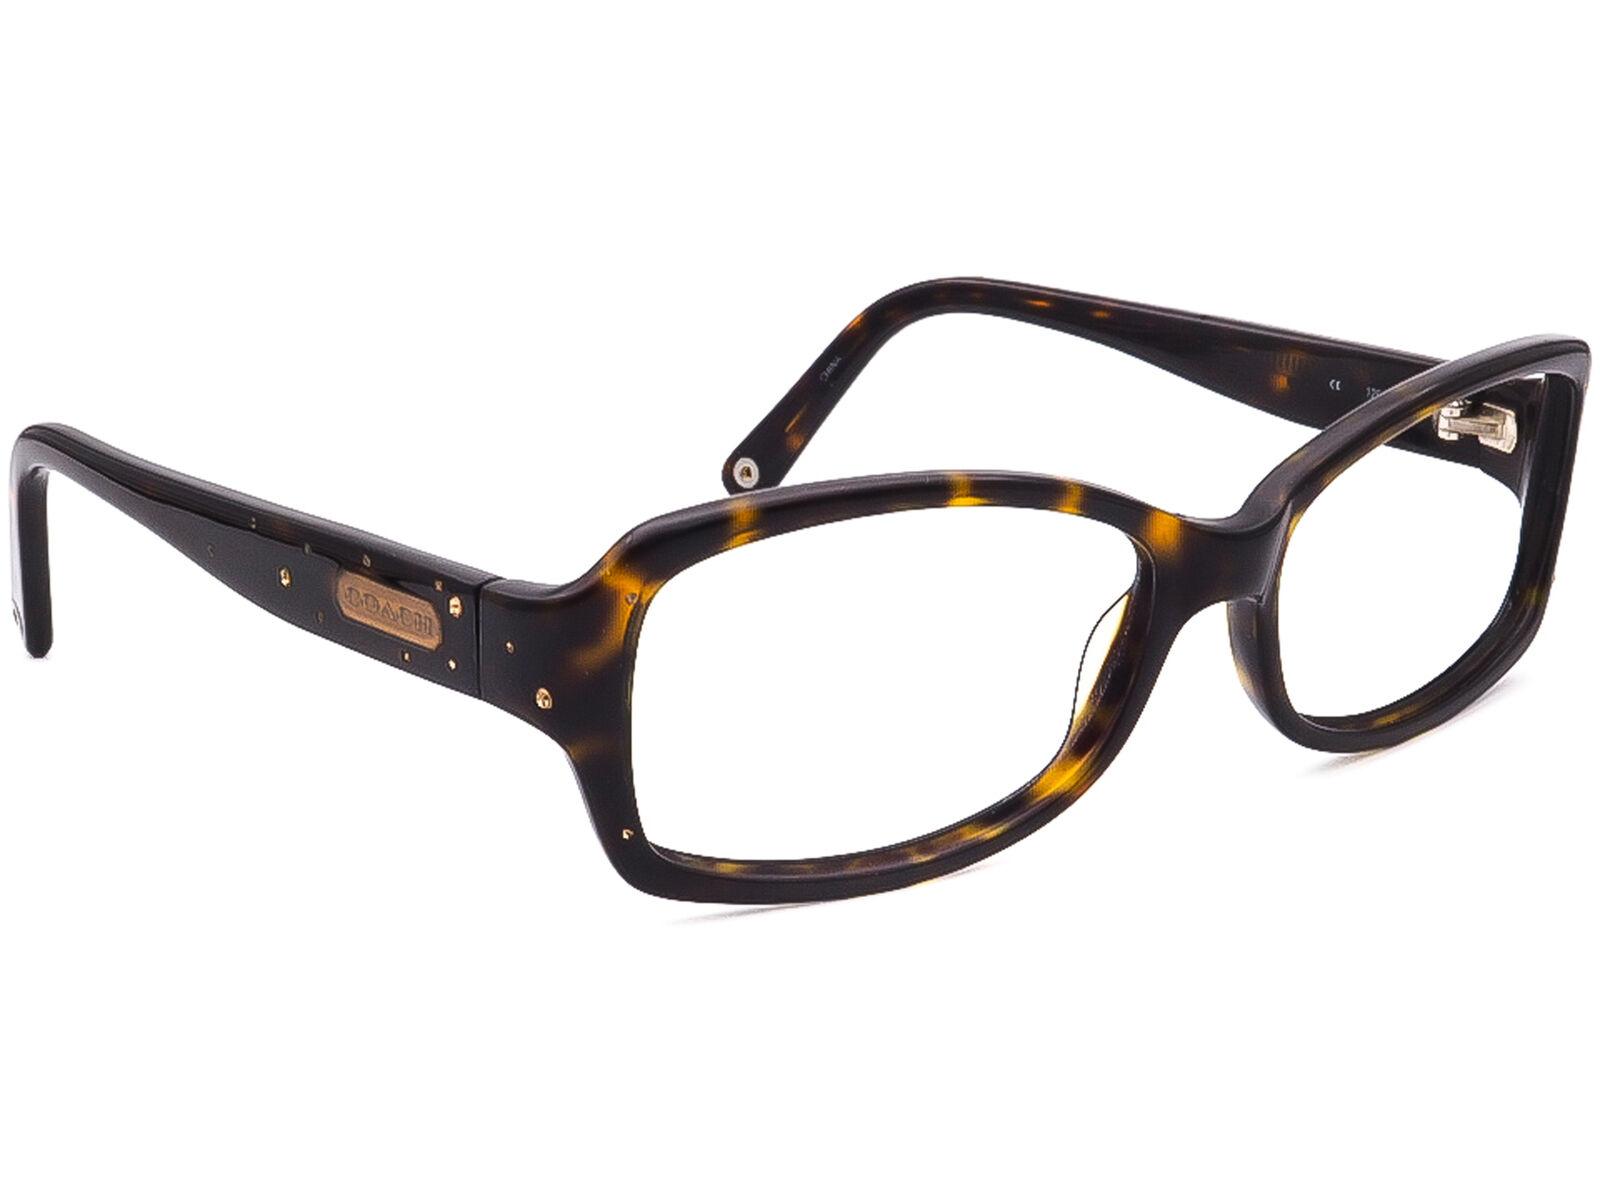 Coach Women's Sunglasses FRAME ONLY Chelsea S426 Tortoise Brown 55[]16 125